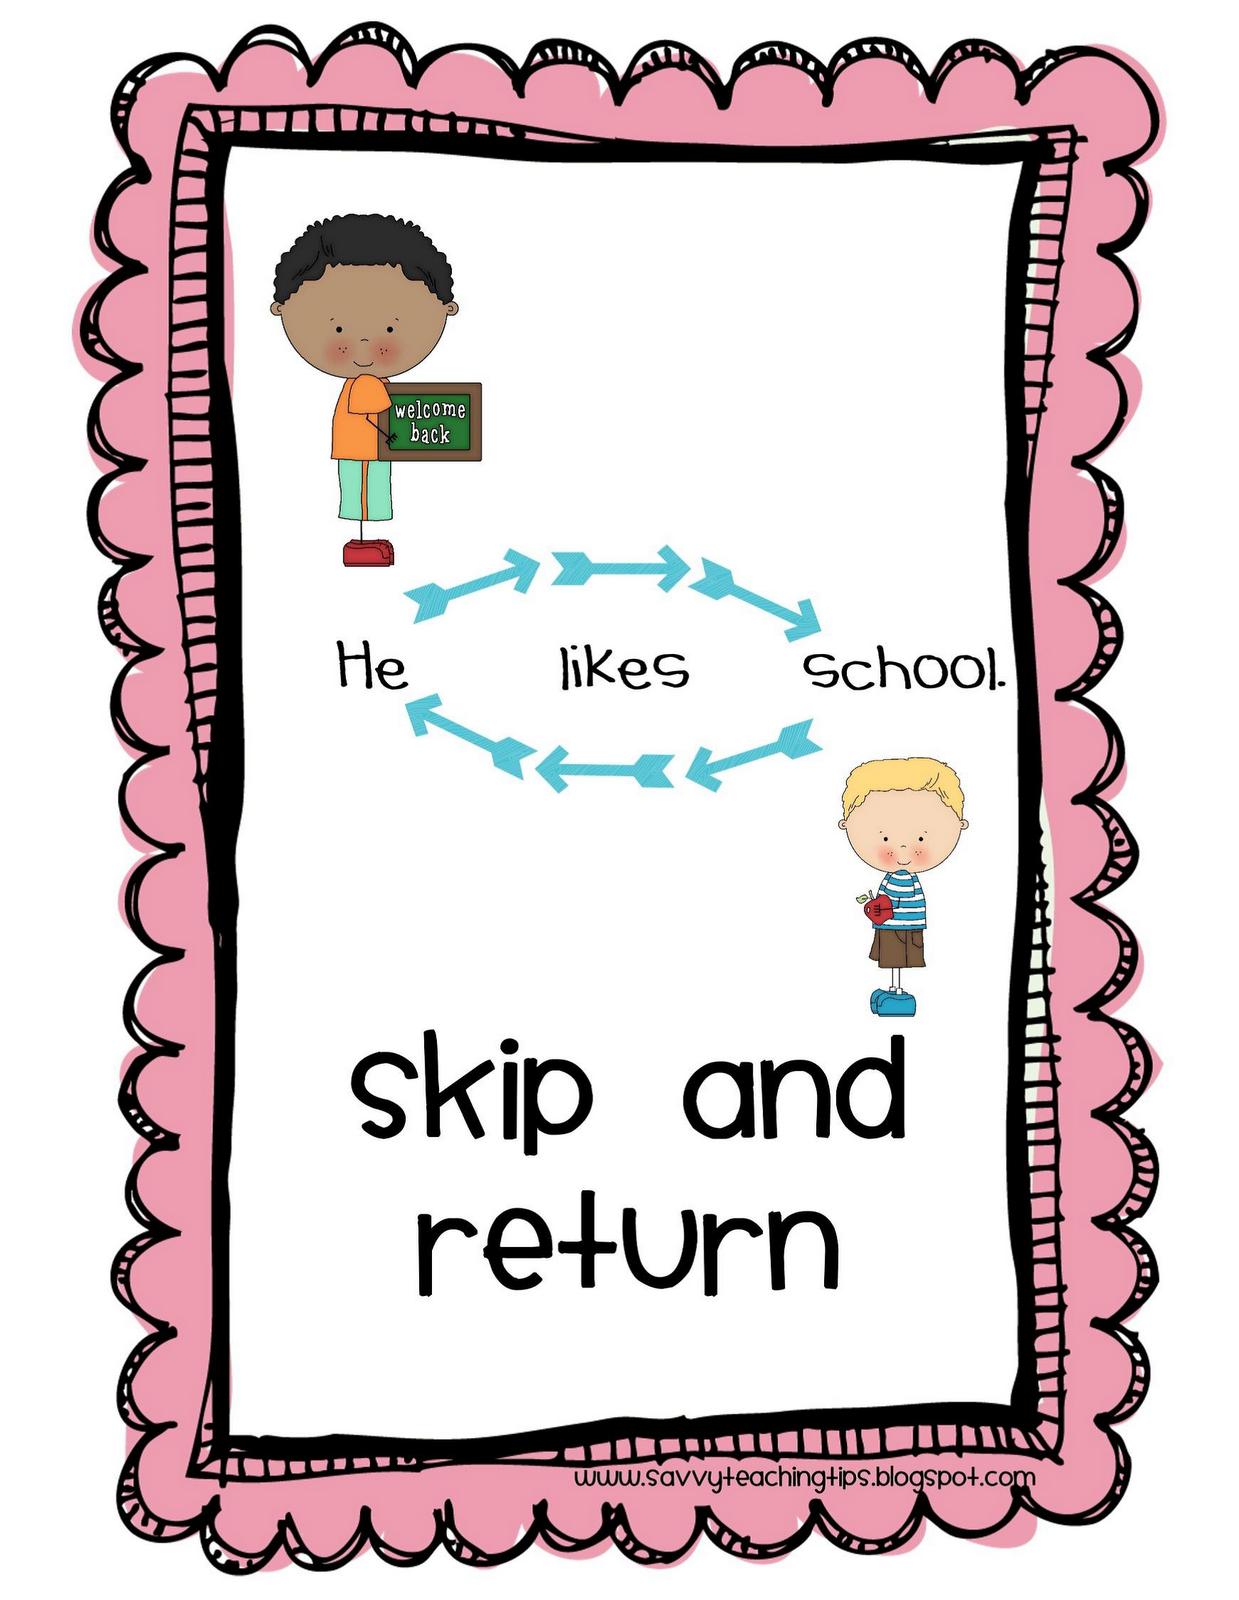 reading+strategies+2 - Reading Strategies For Kindergarten